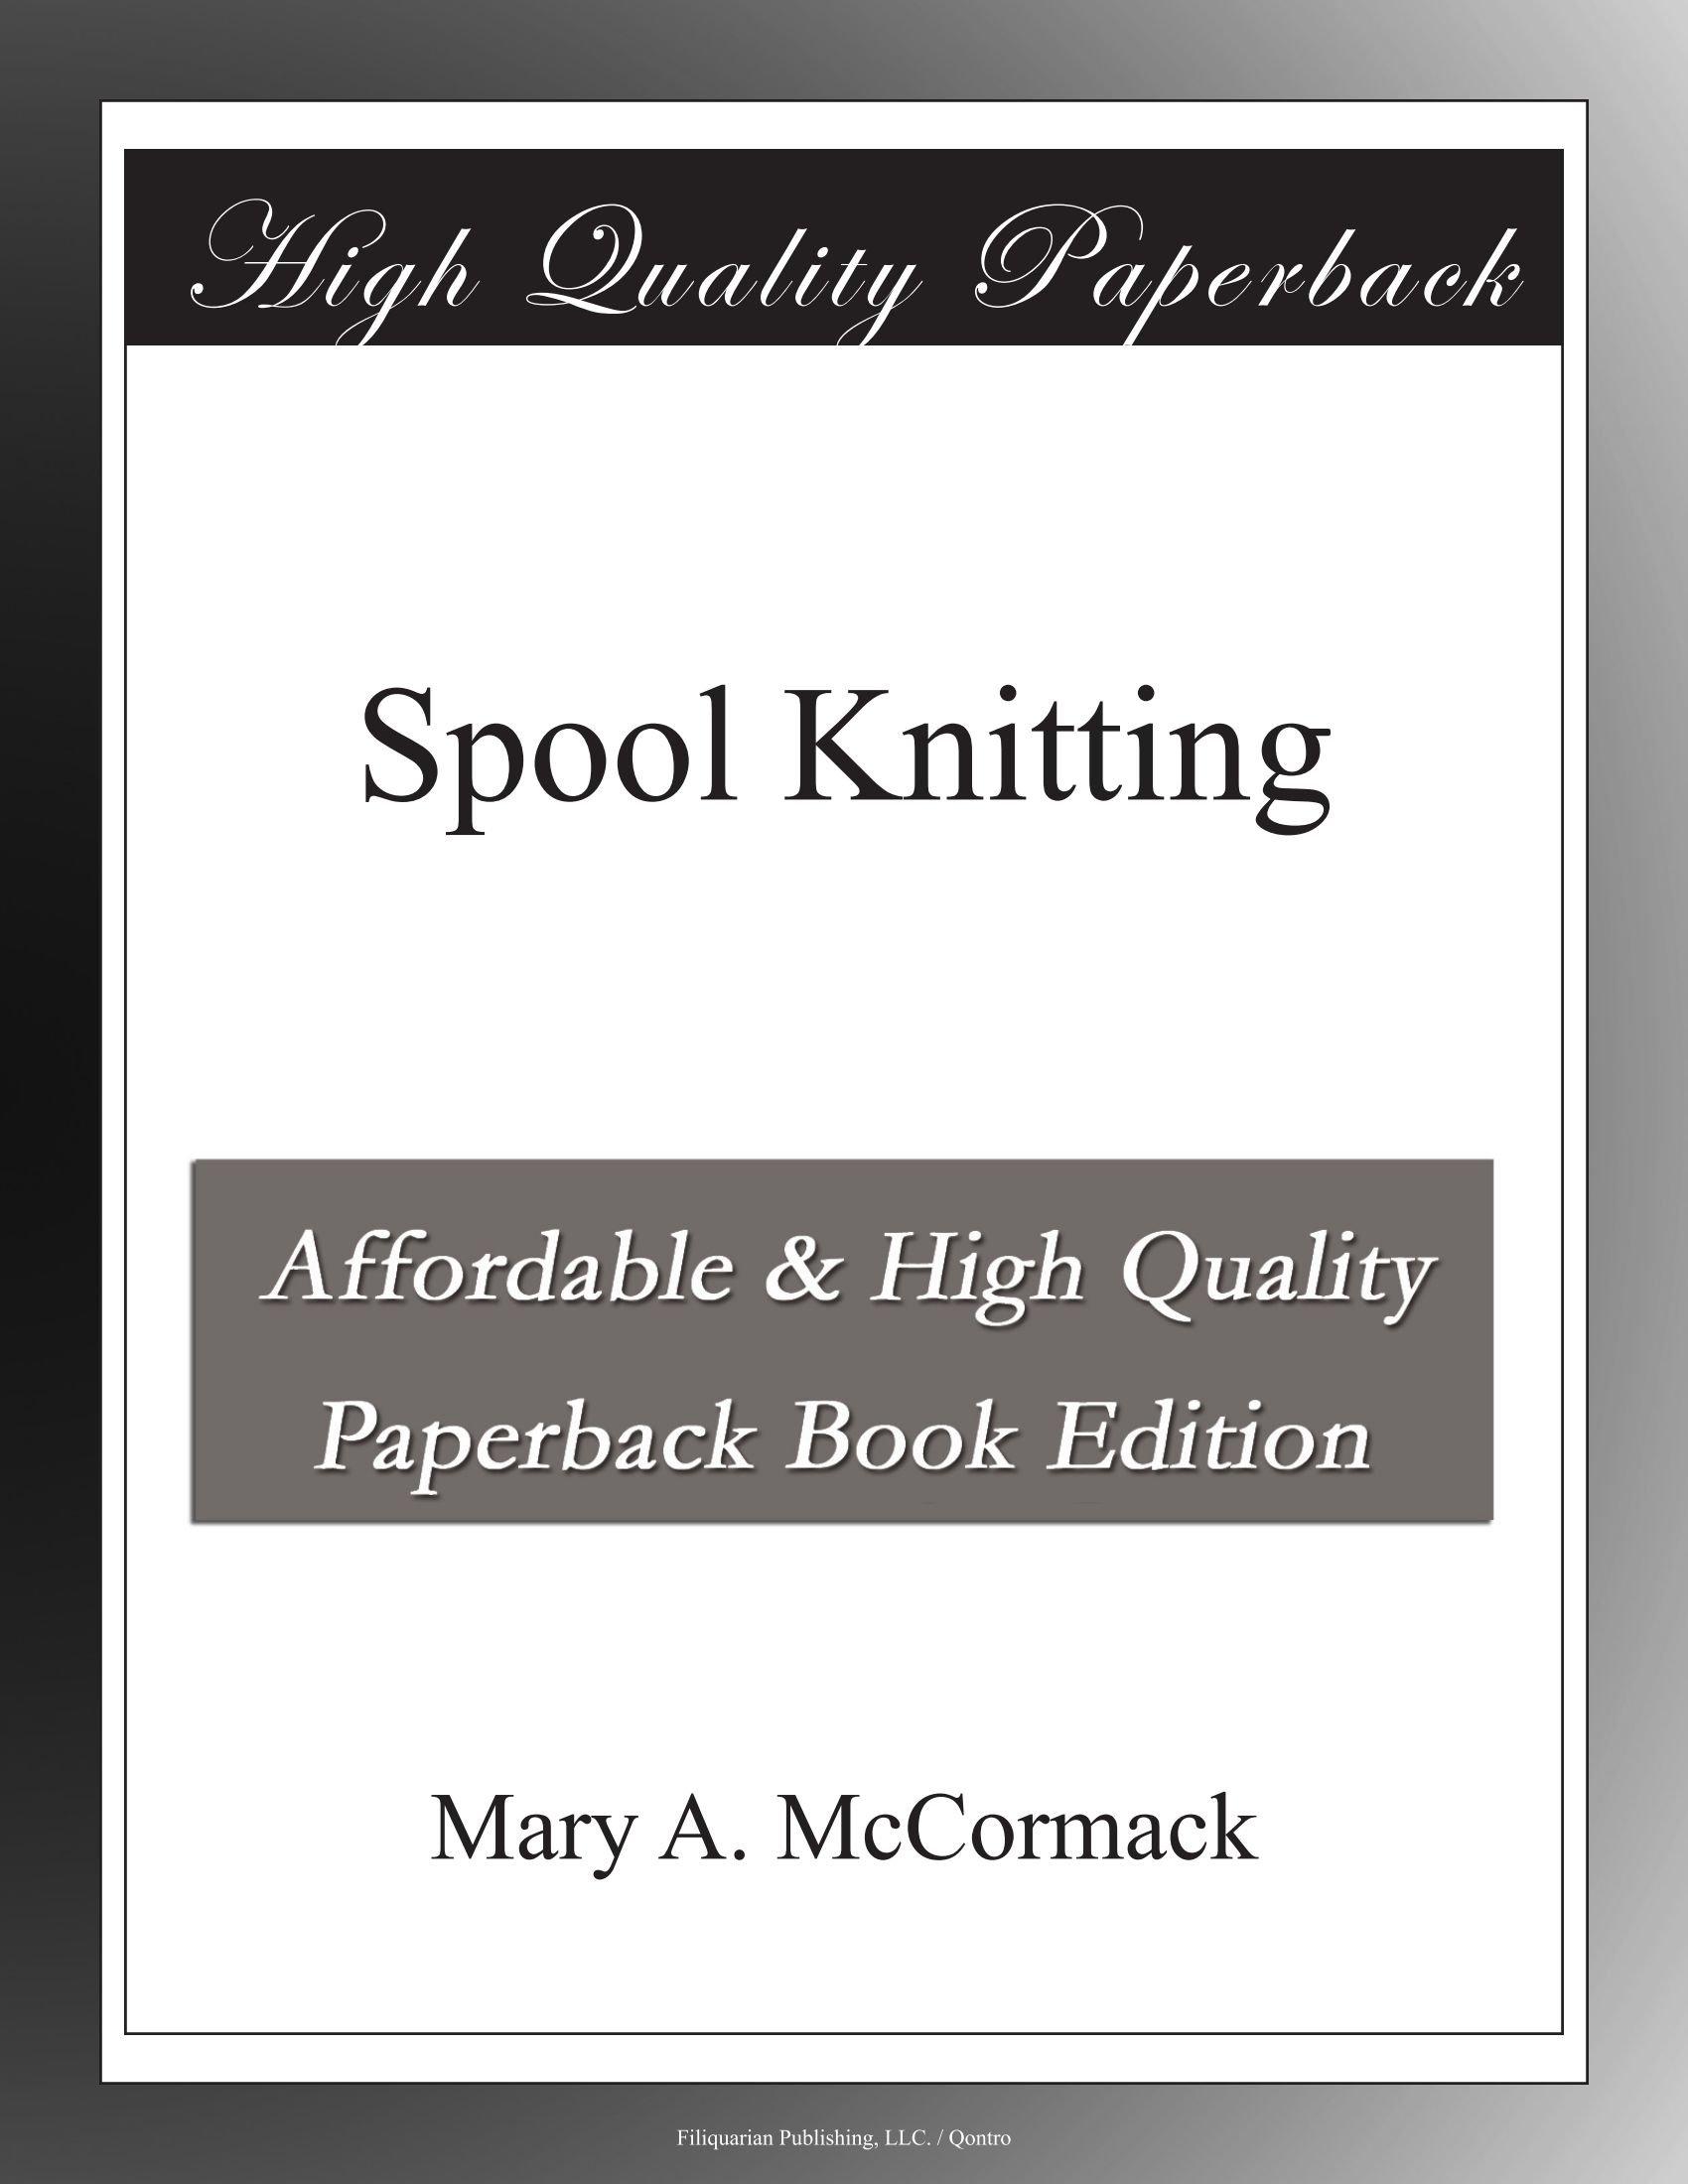 Spool Knitting: Mary A. McCormack: Amazon.com: Books